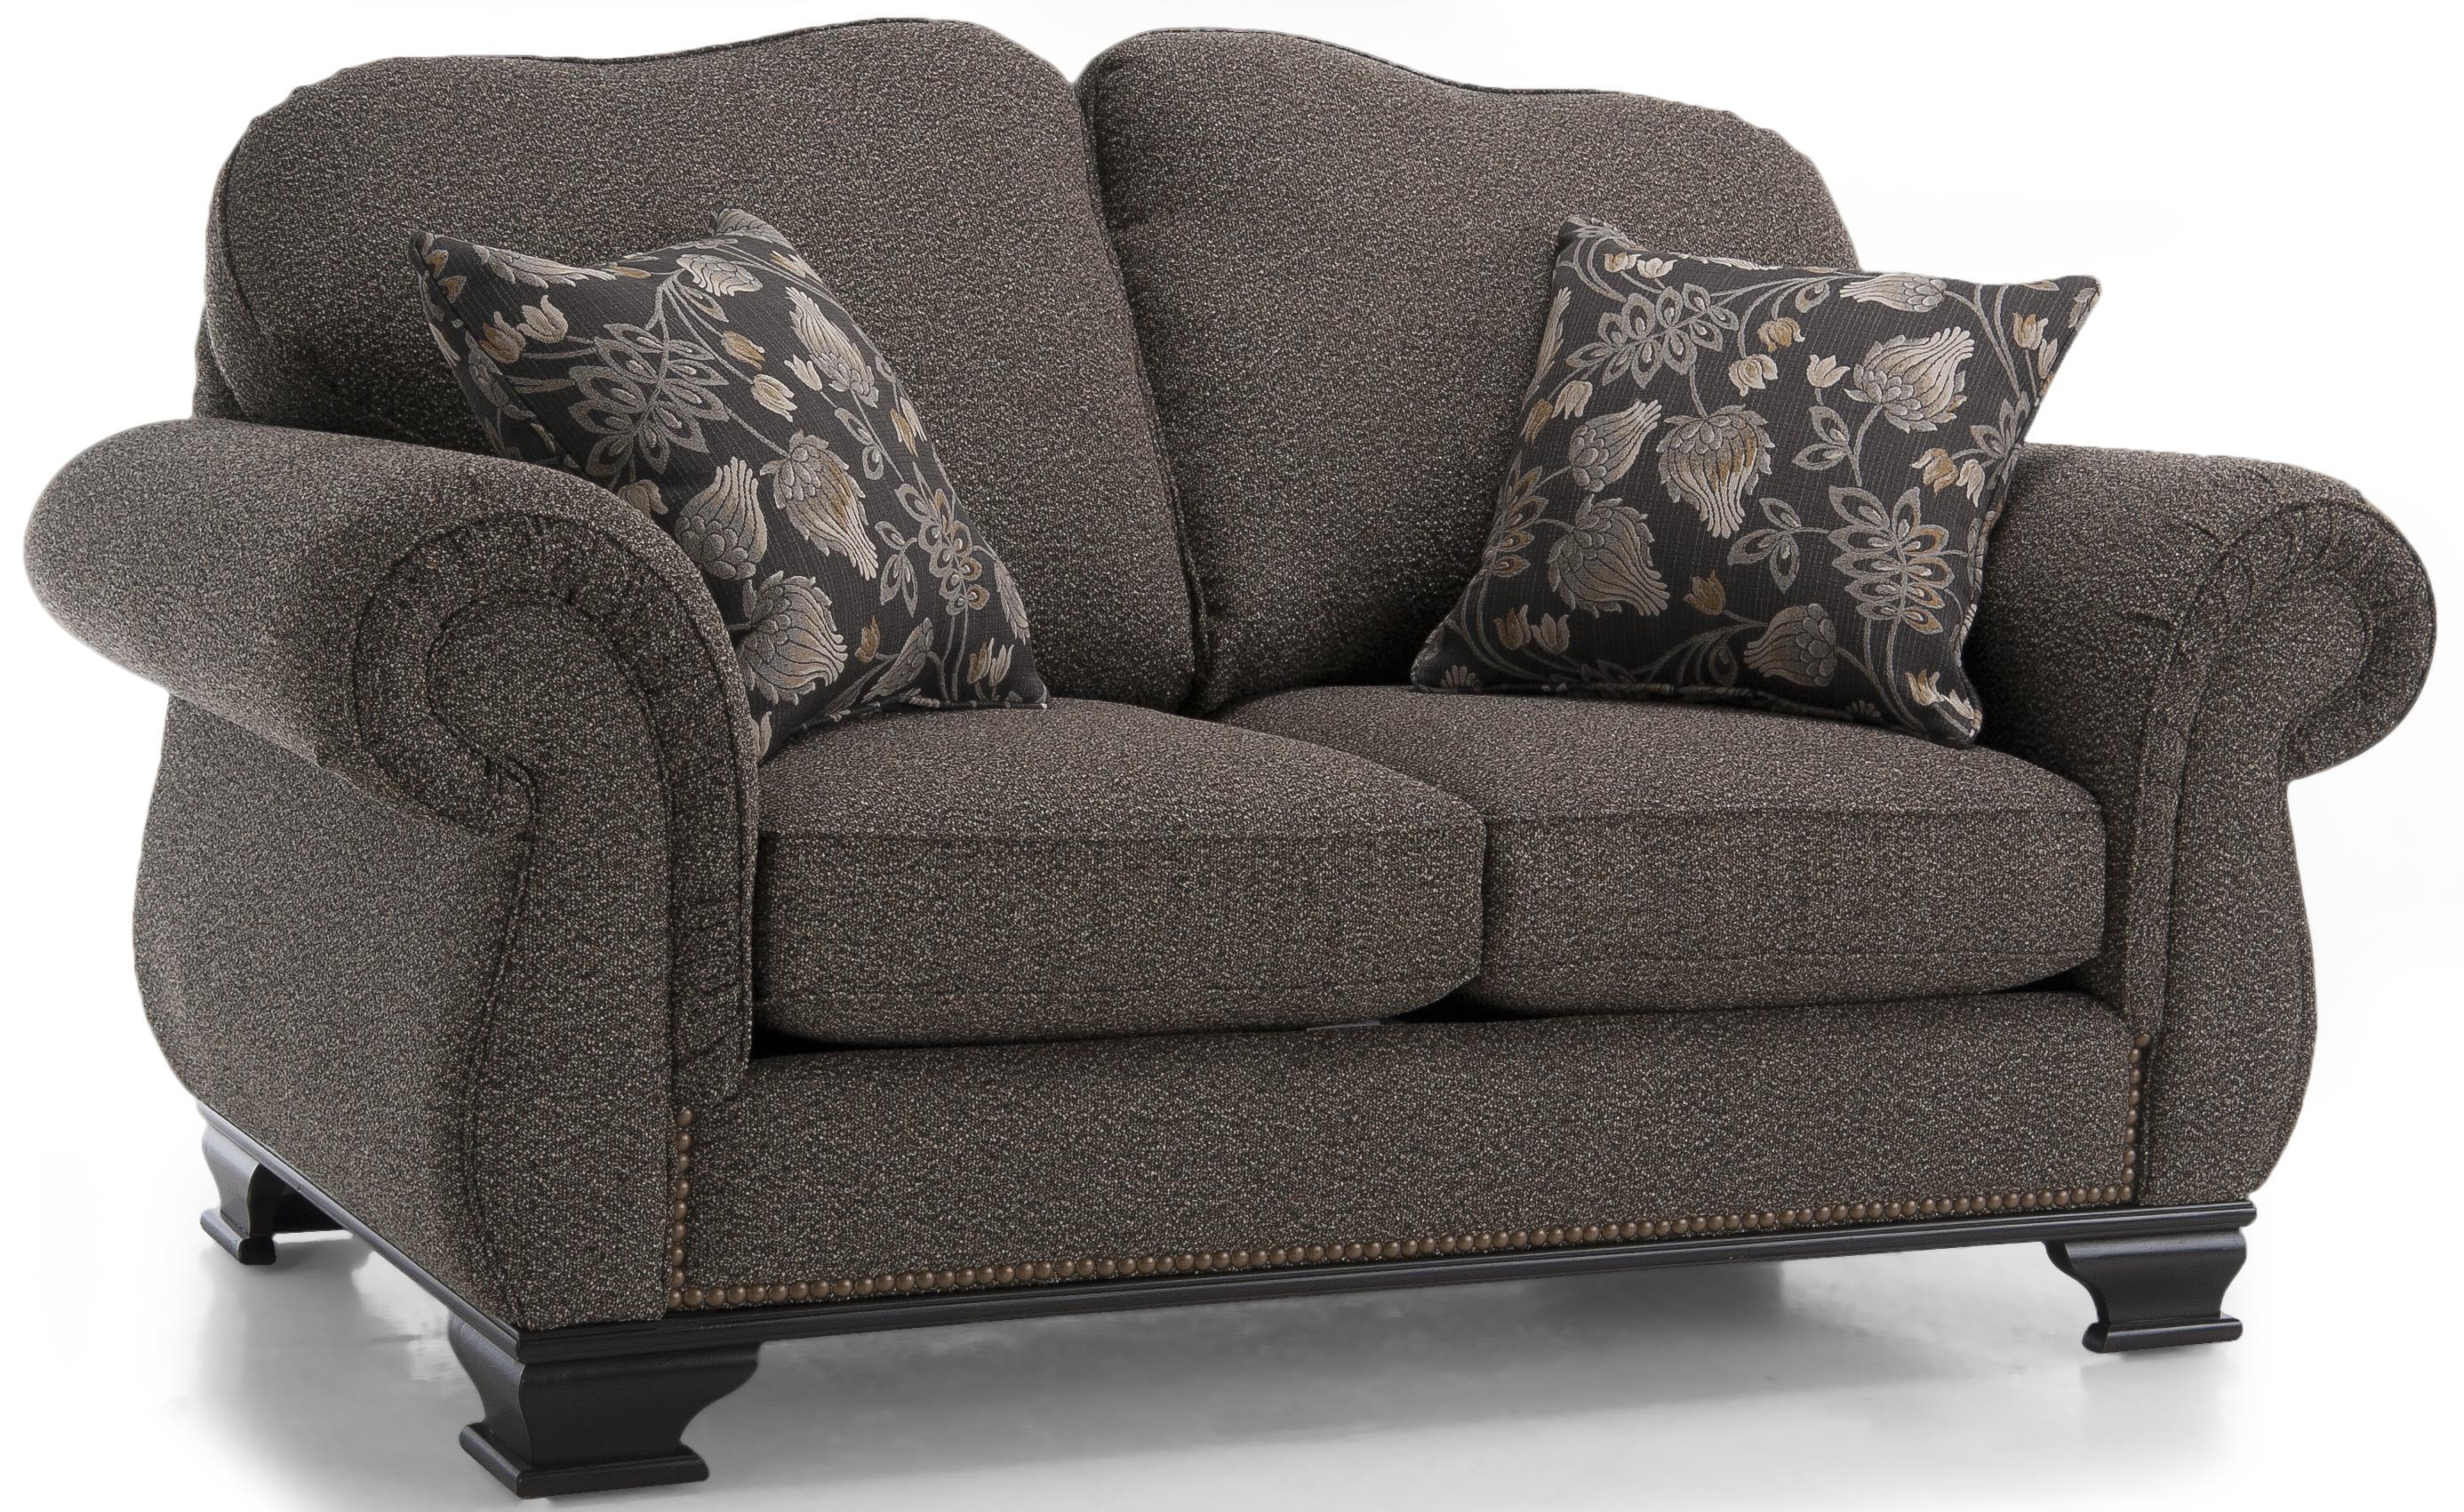 Decor Rest 6933 Love Seat Stoney Creek Furniture Love